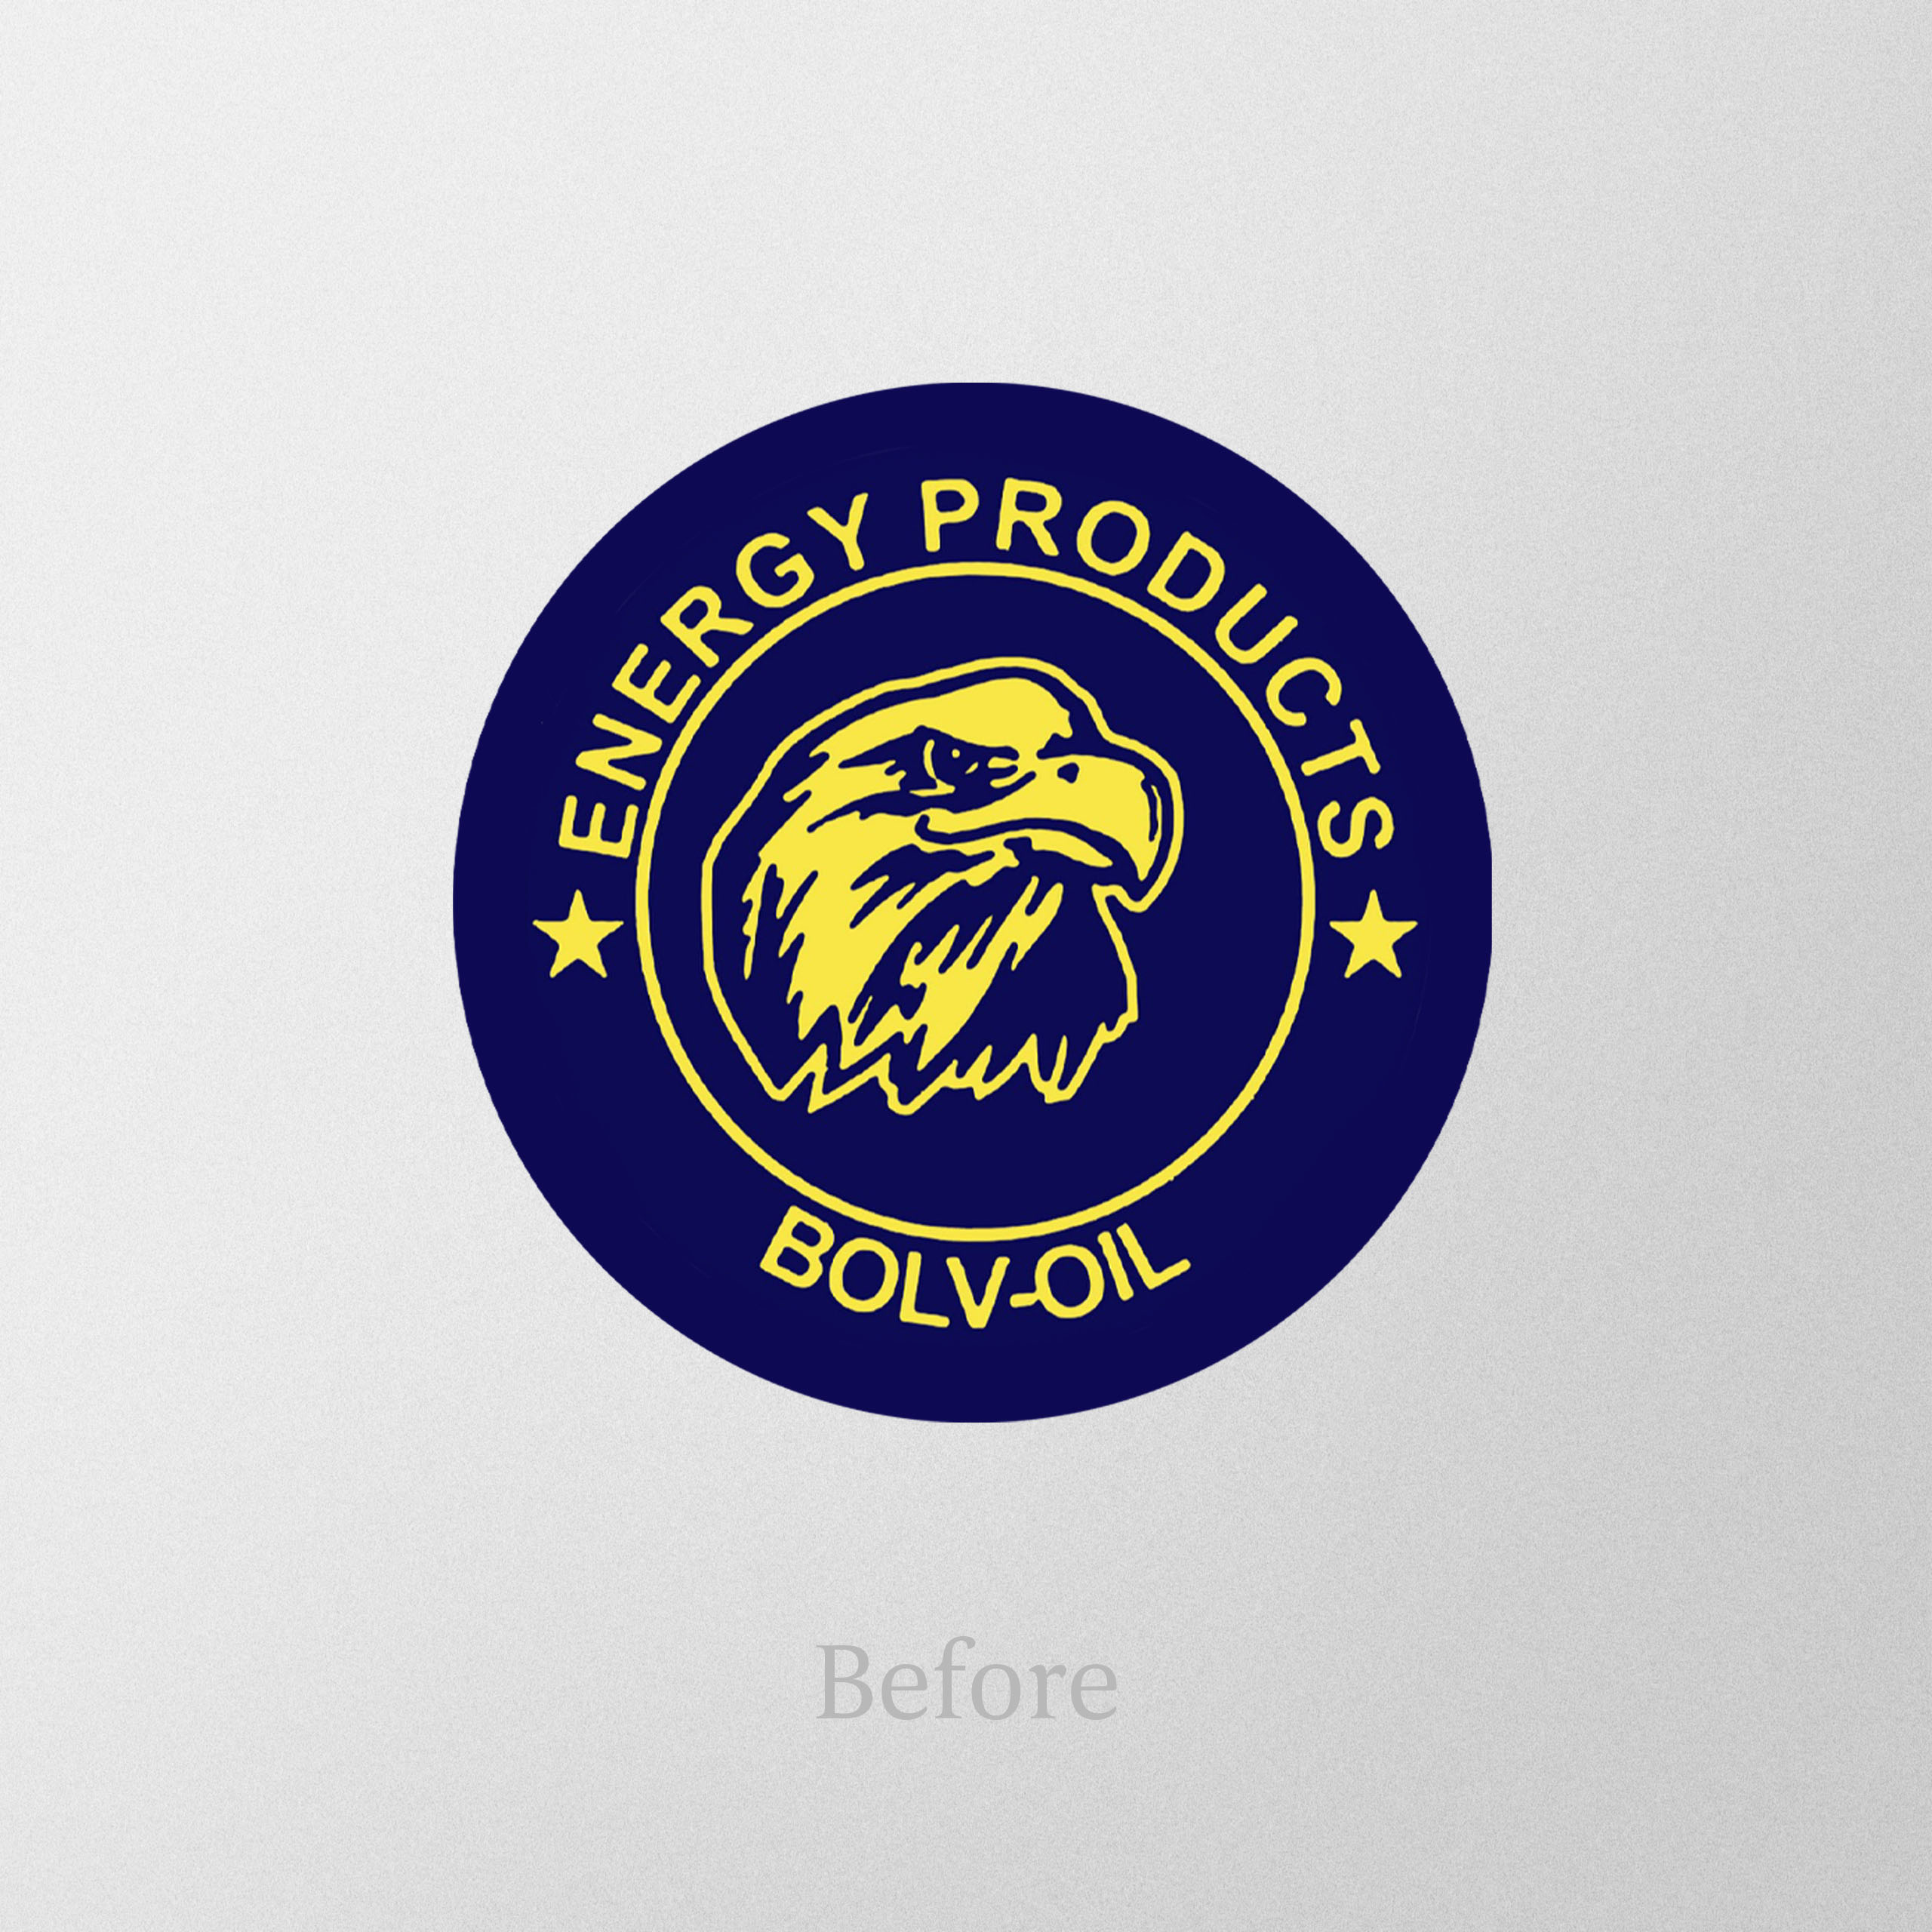 Bolv Project Img 7 - Vatra Agency / Founder & CEO Gerton Bejo